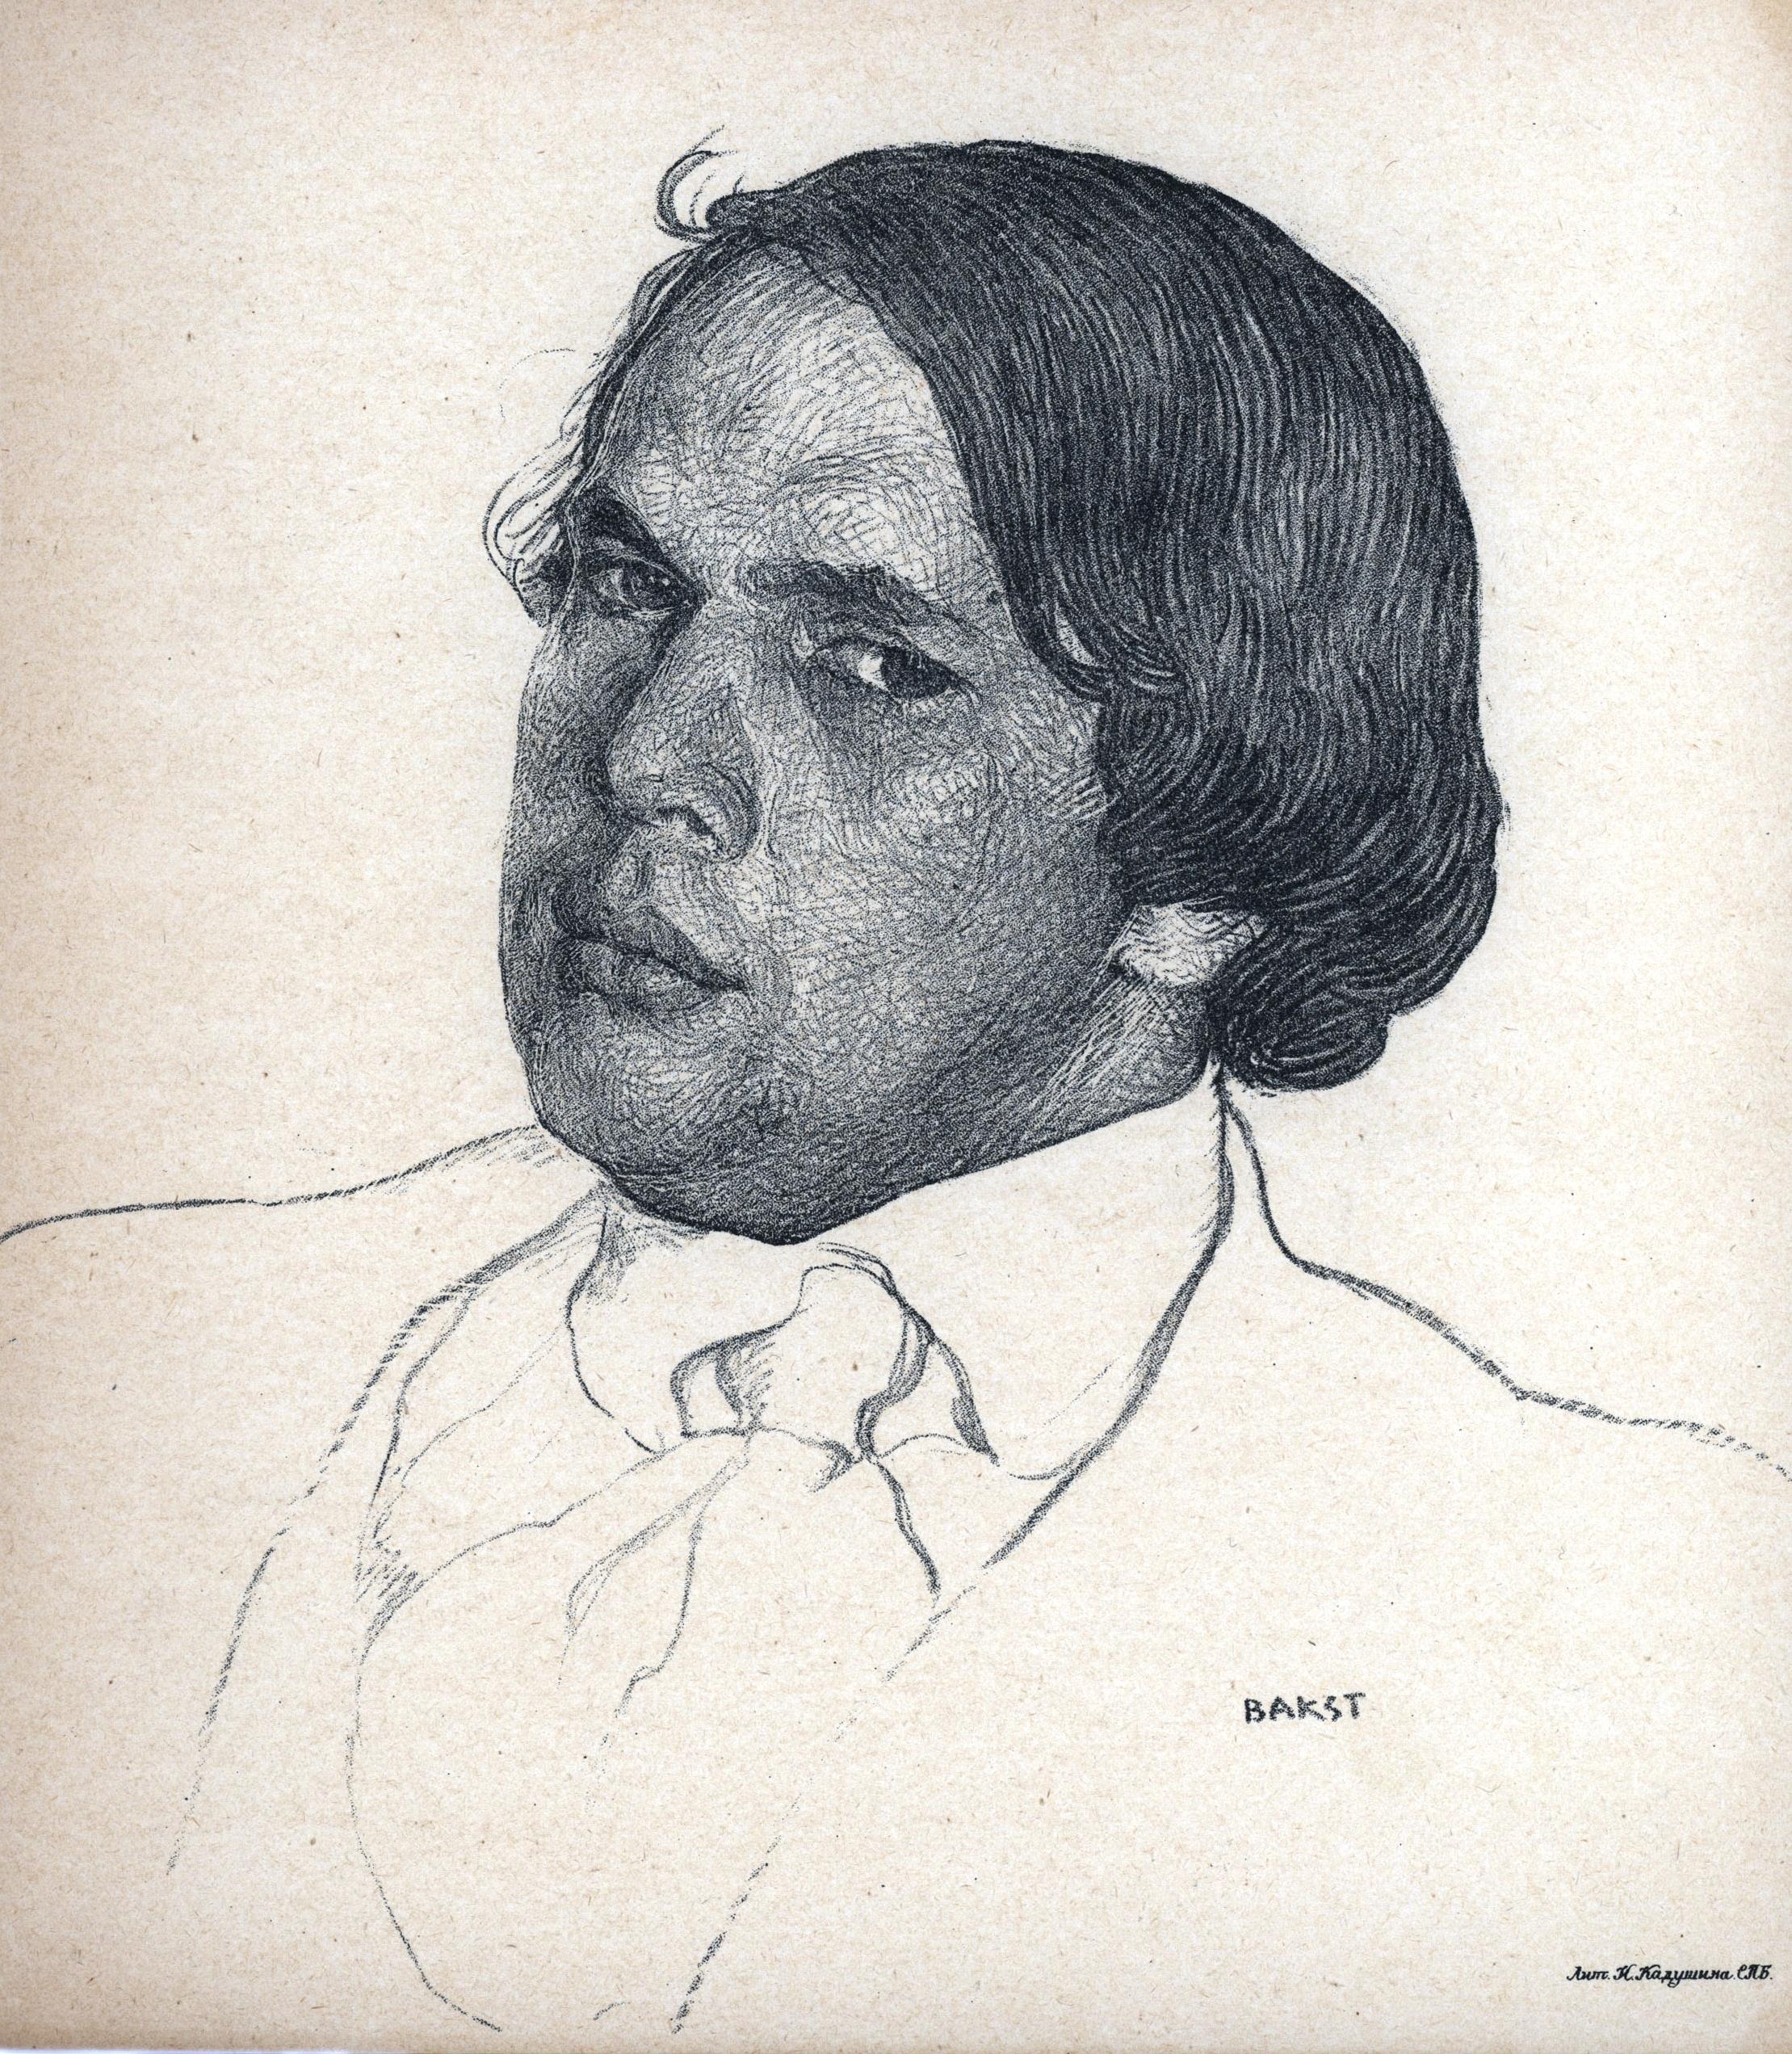 File:Бакст Портрет А. Н. Толстого.jpg